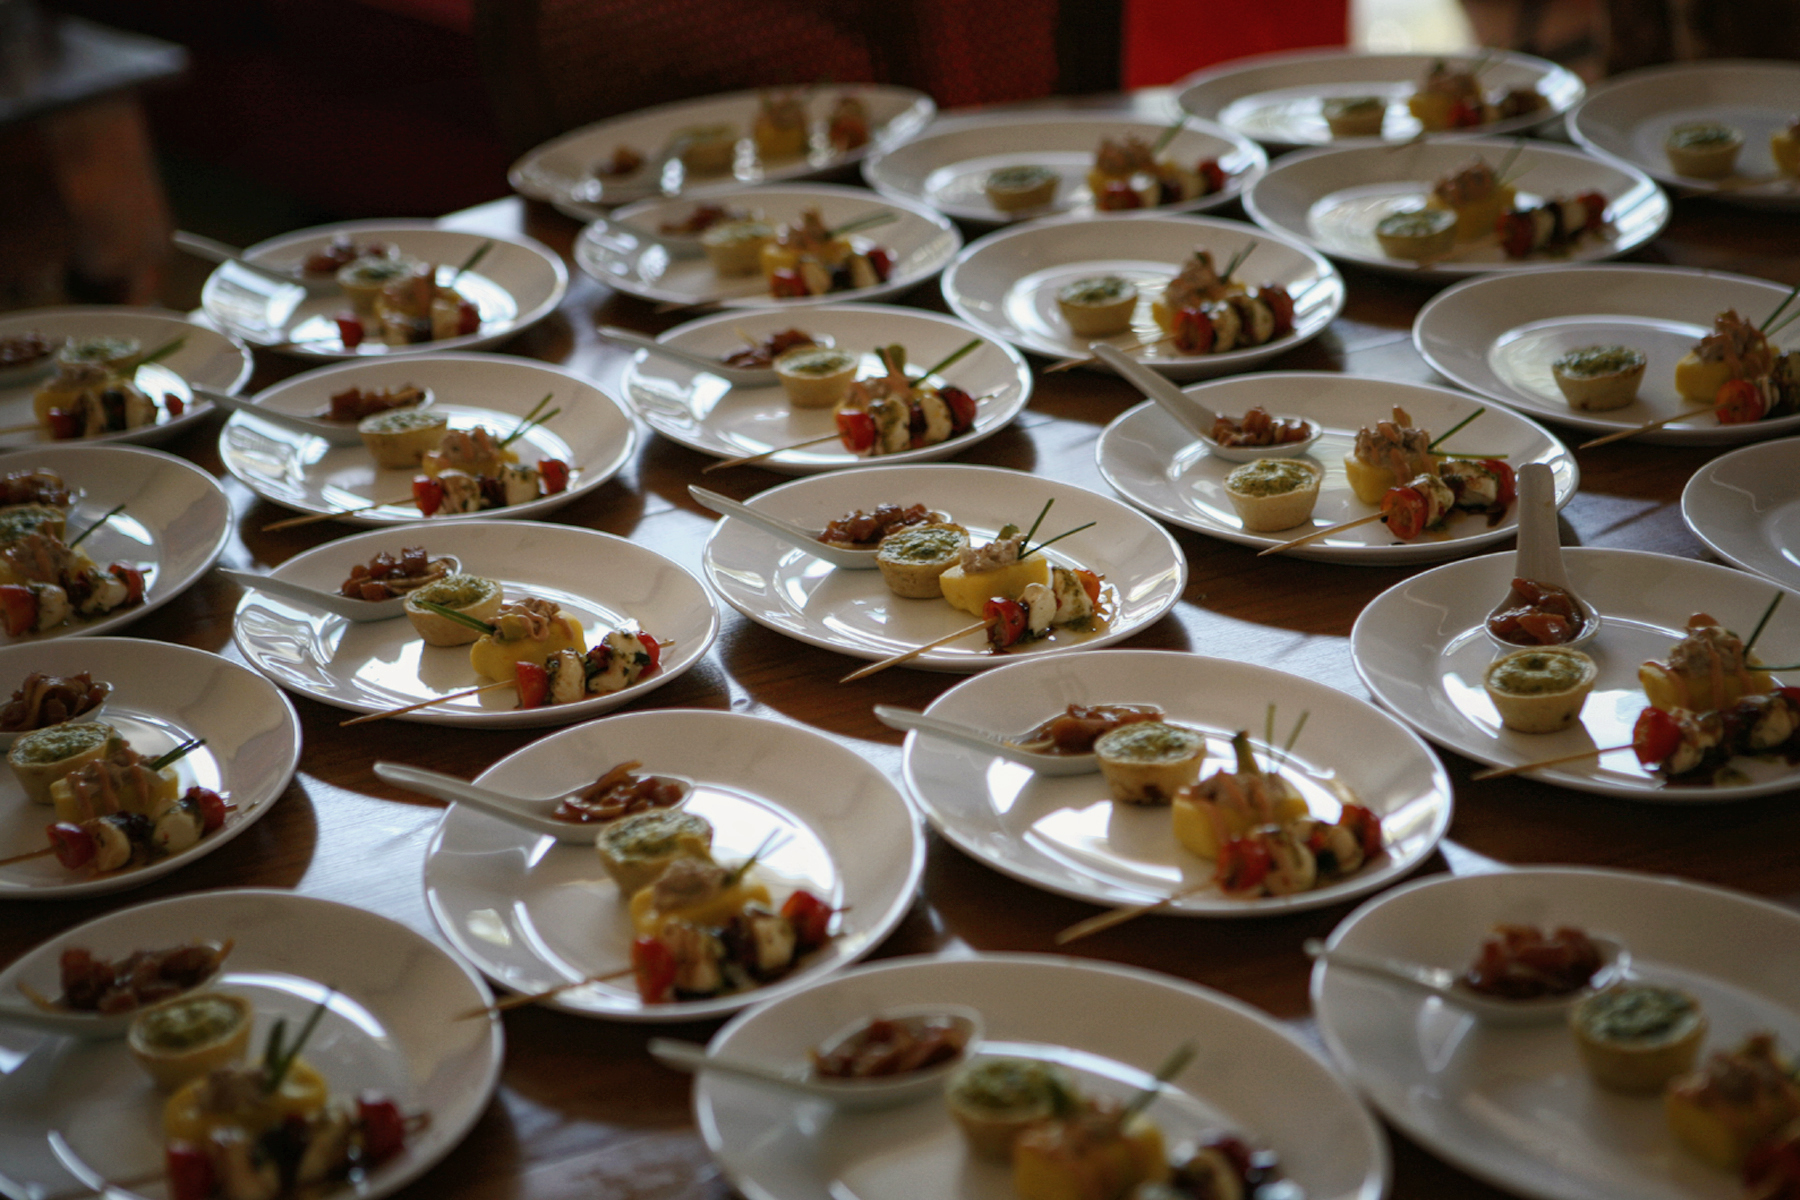 43-orlando-kosher-catering-delicious-elegant-event-photographer.JPG